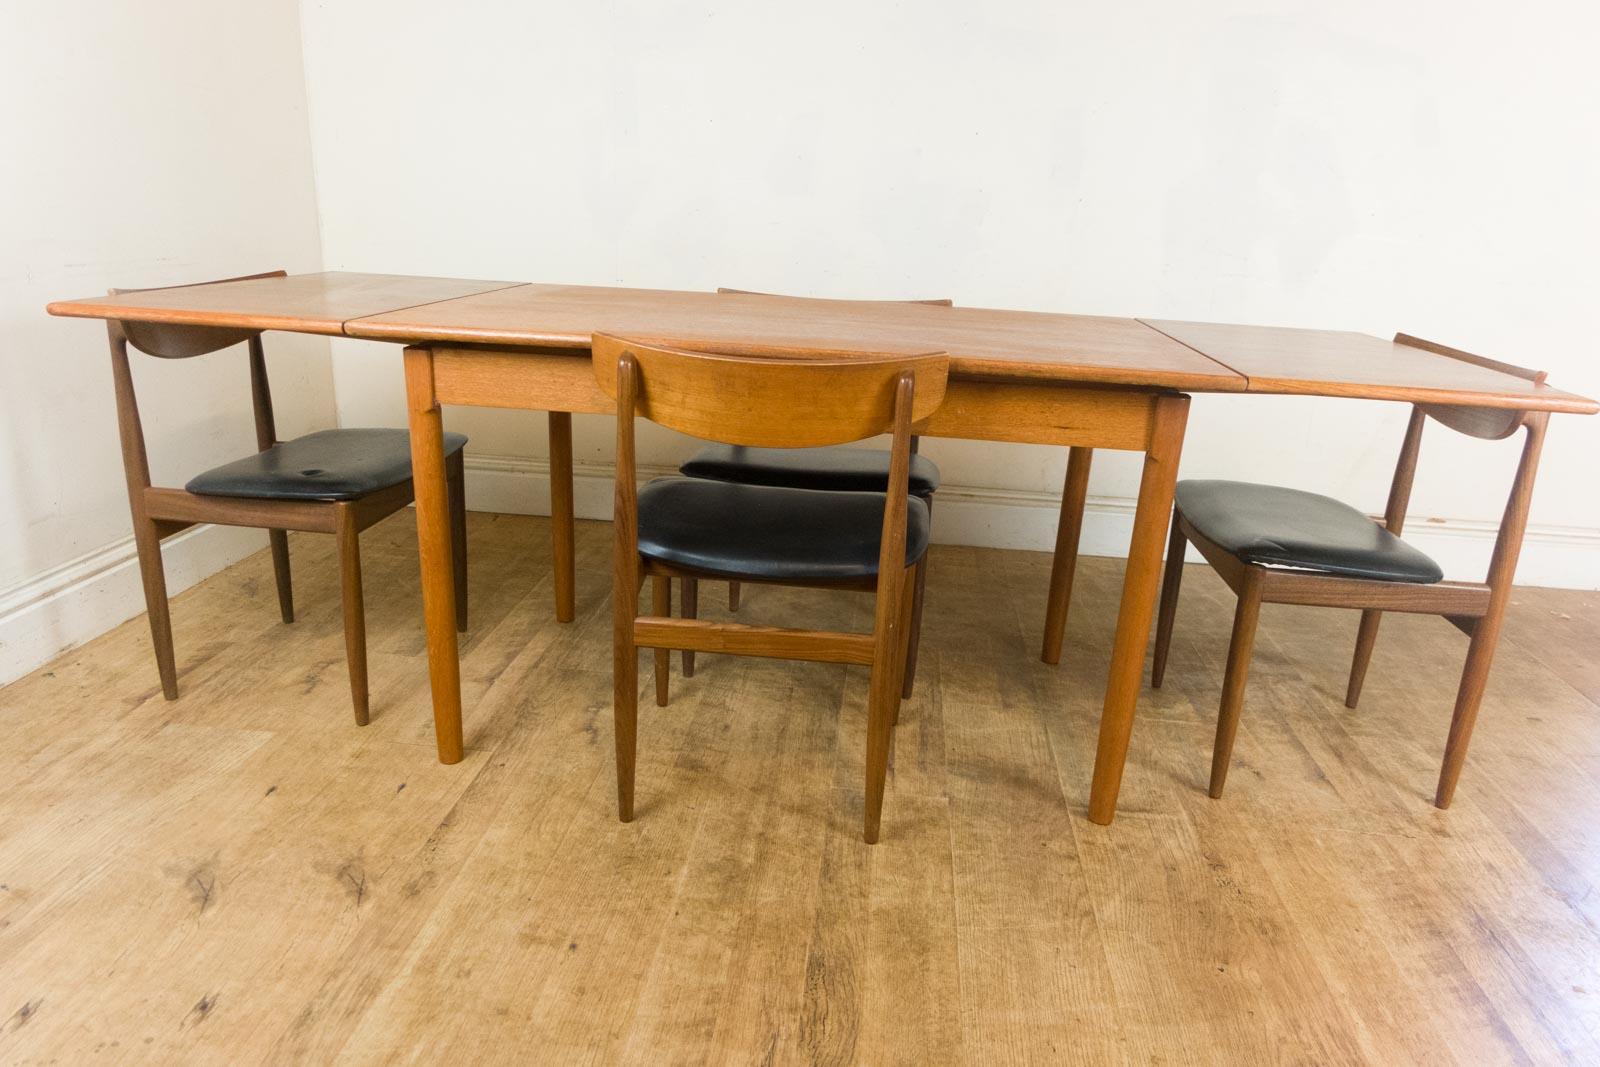 Vintage Retro Teak Extending Dining Table And 4 G Plan